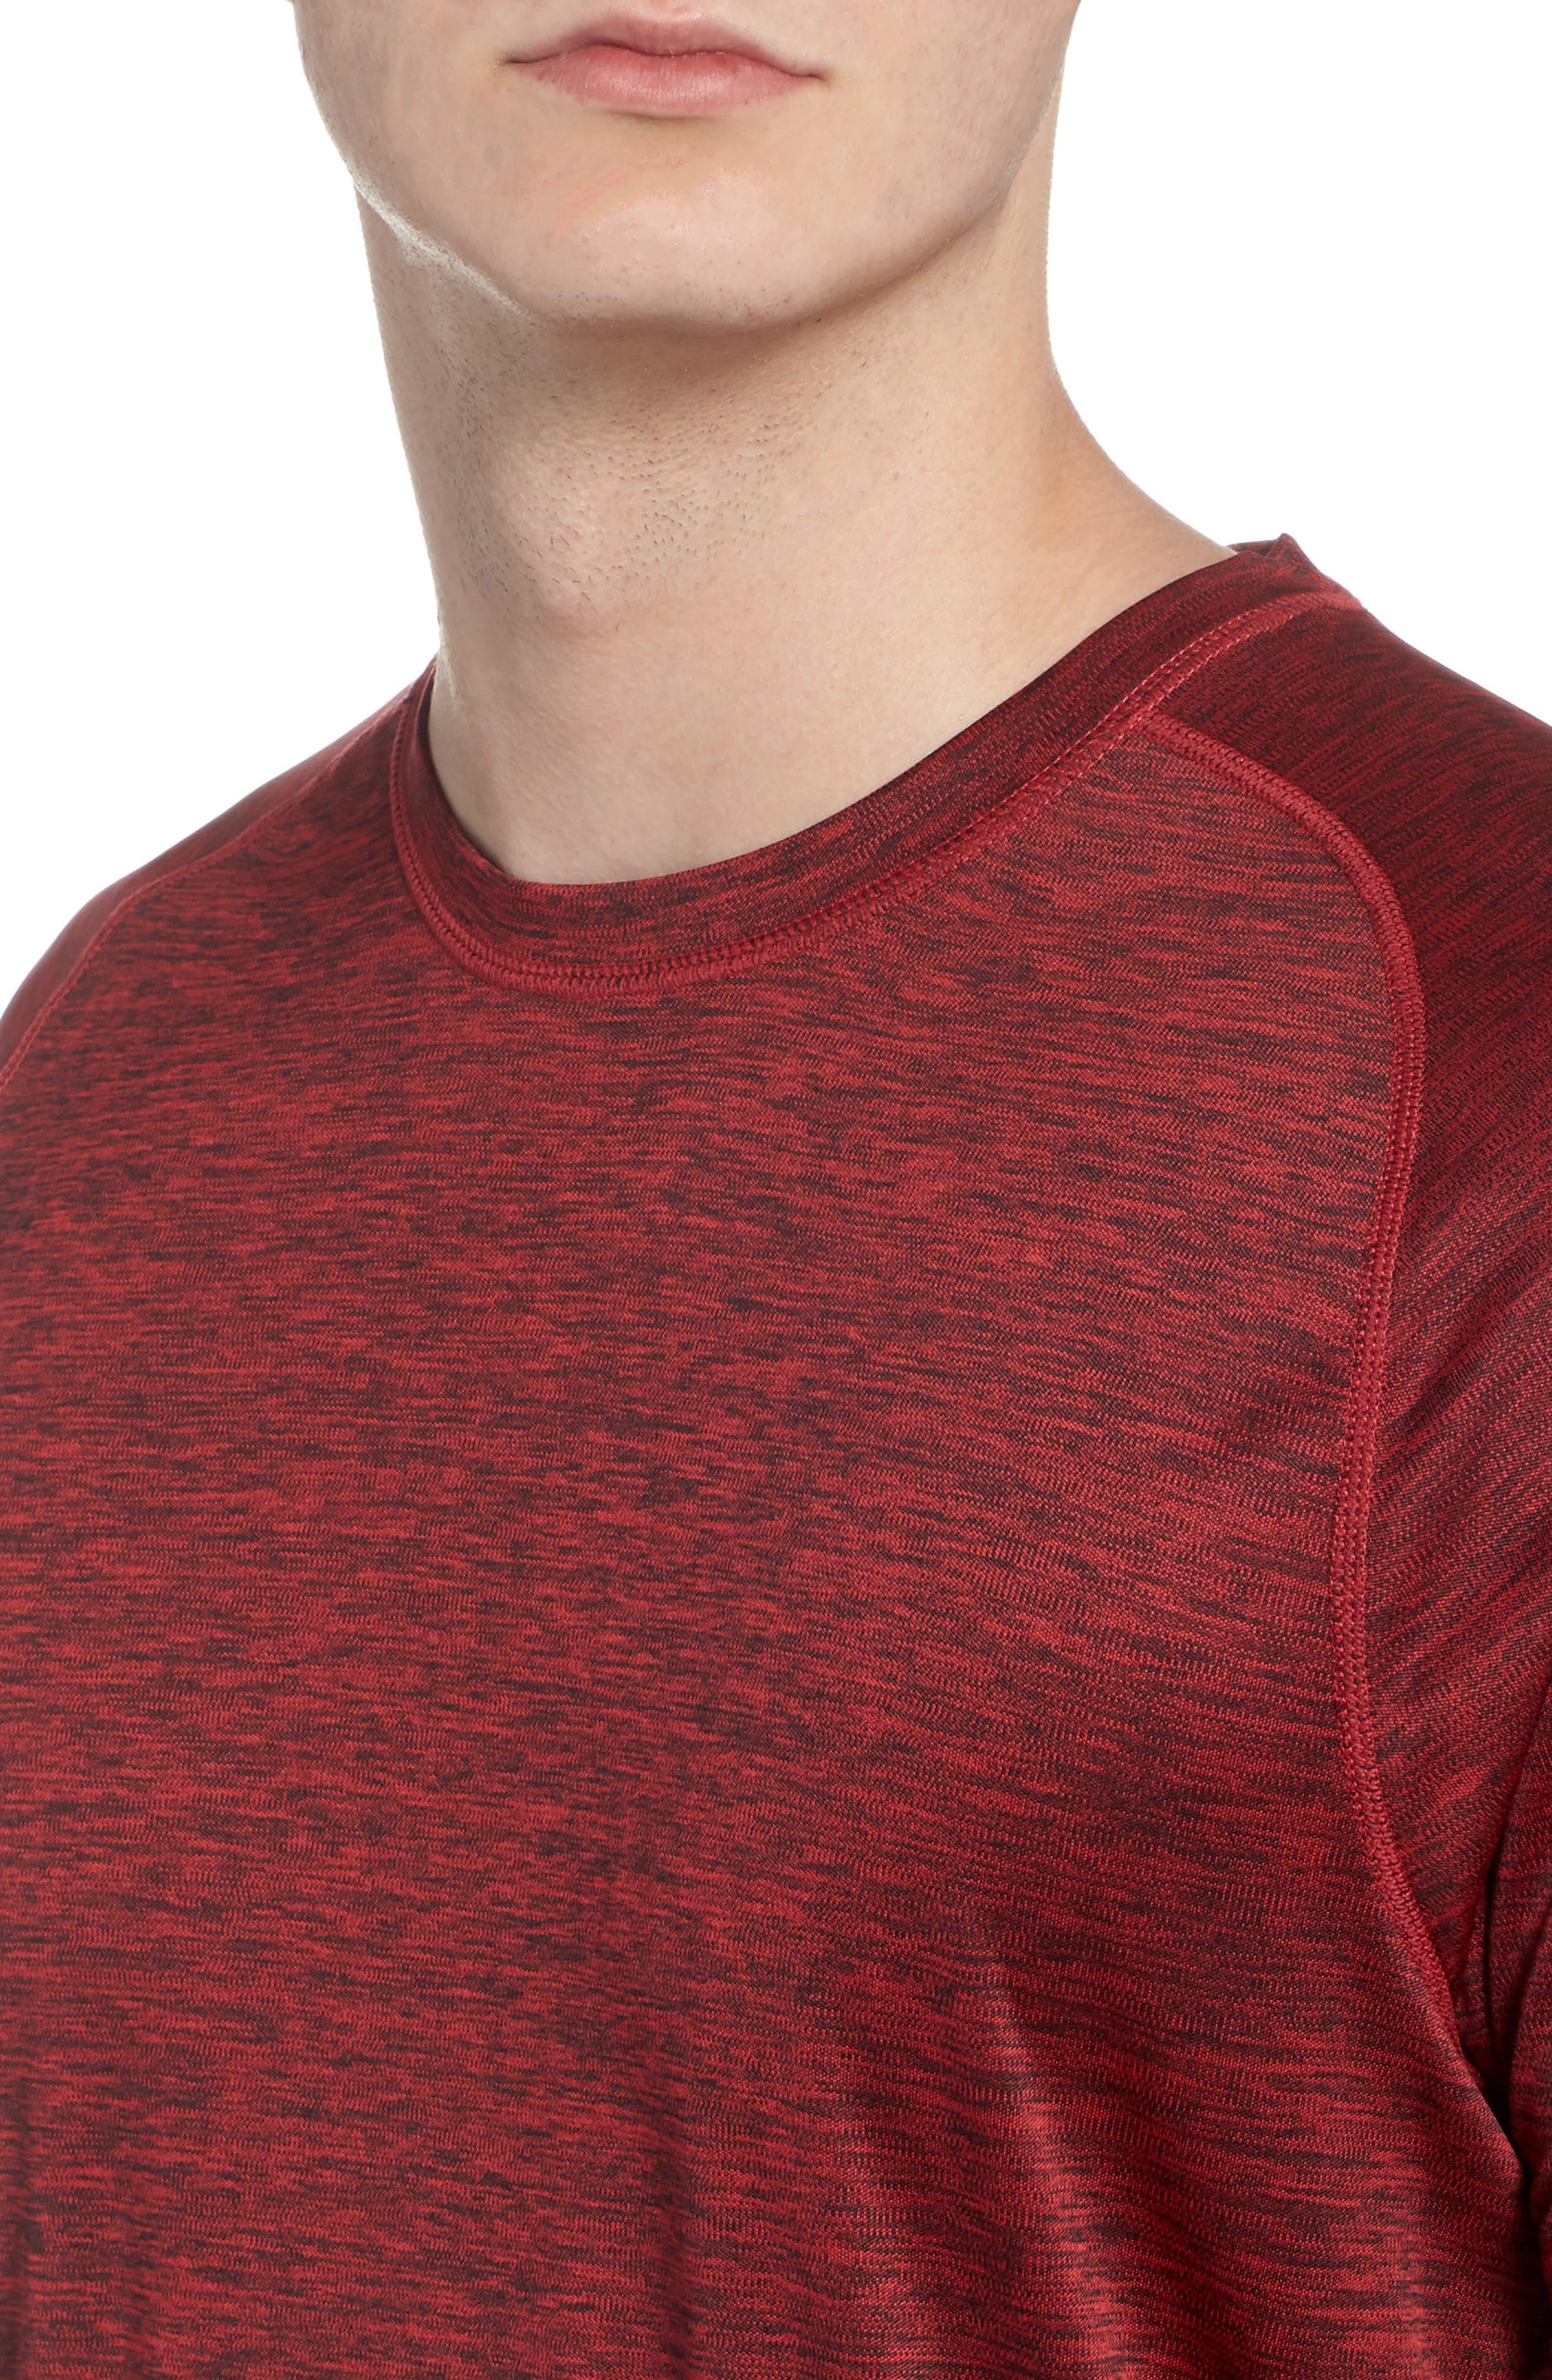 Triplite T-Shirt,                             Alternate thumbnail 52, color,